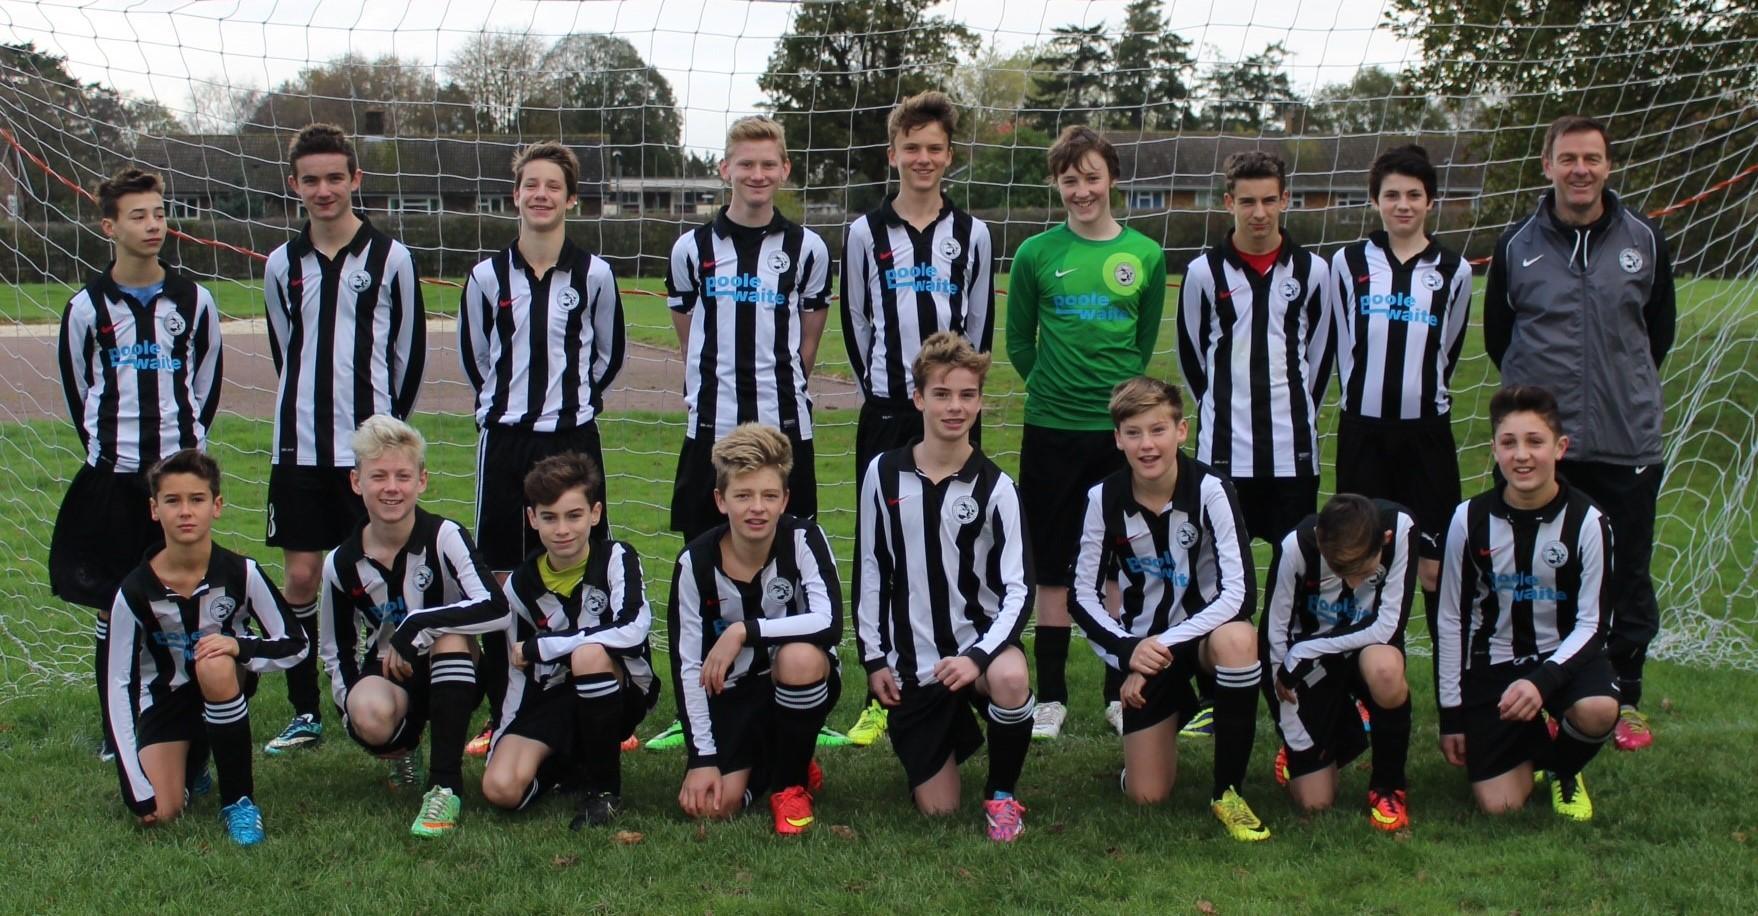 Brockham Badgers U16 Blues